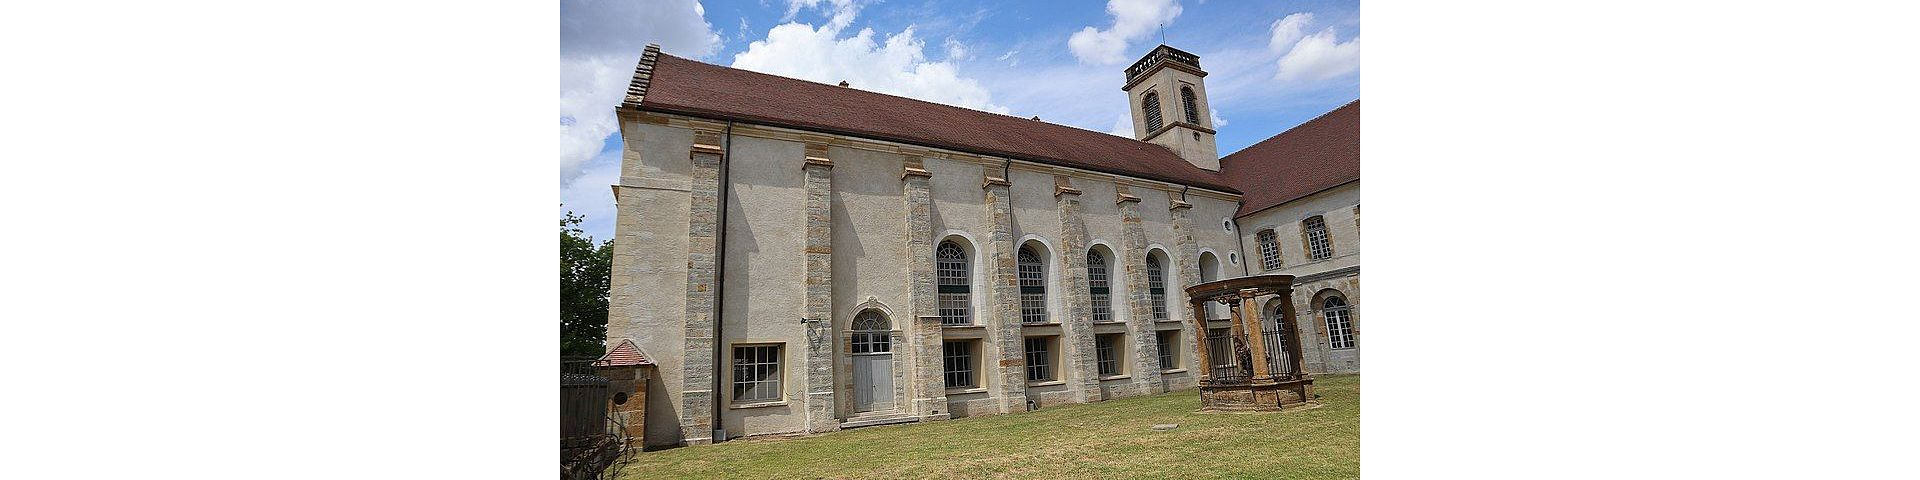 Corbigny - Abbaye St-Léonard (58)